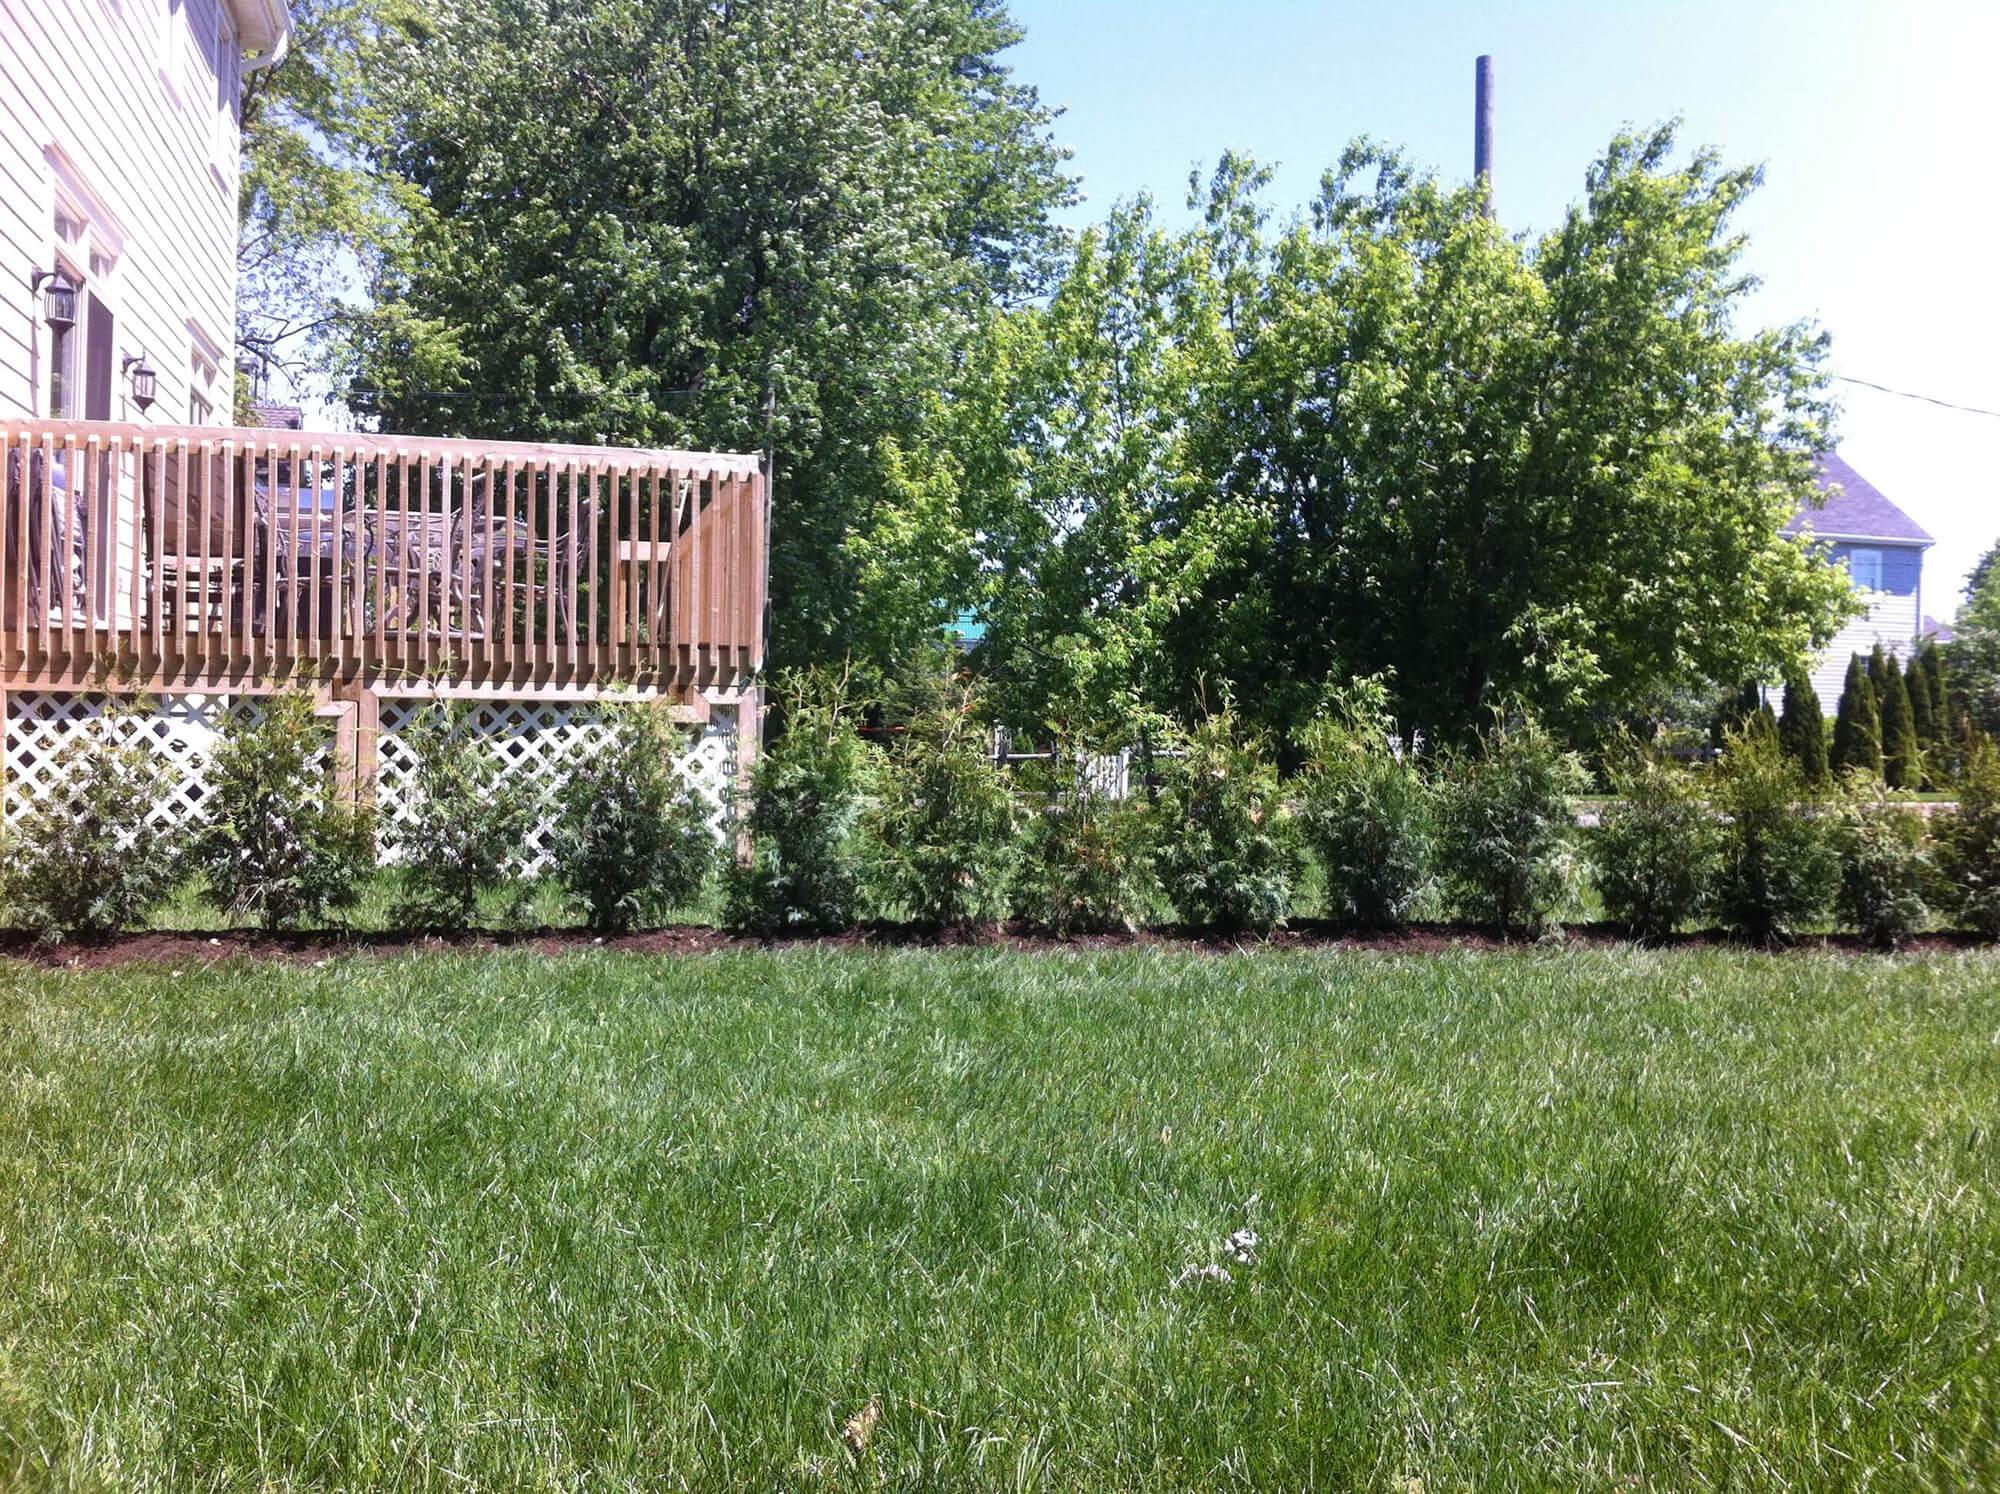 3.1-plantation-3-4-27-05-2013-2